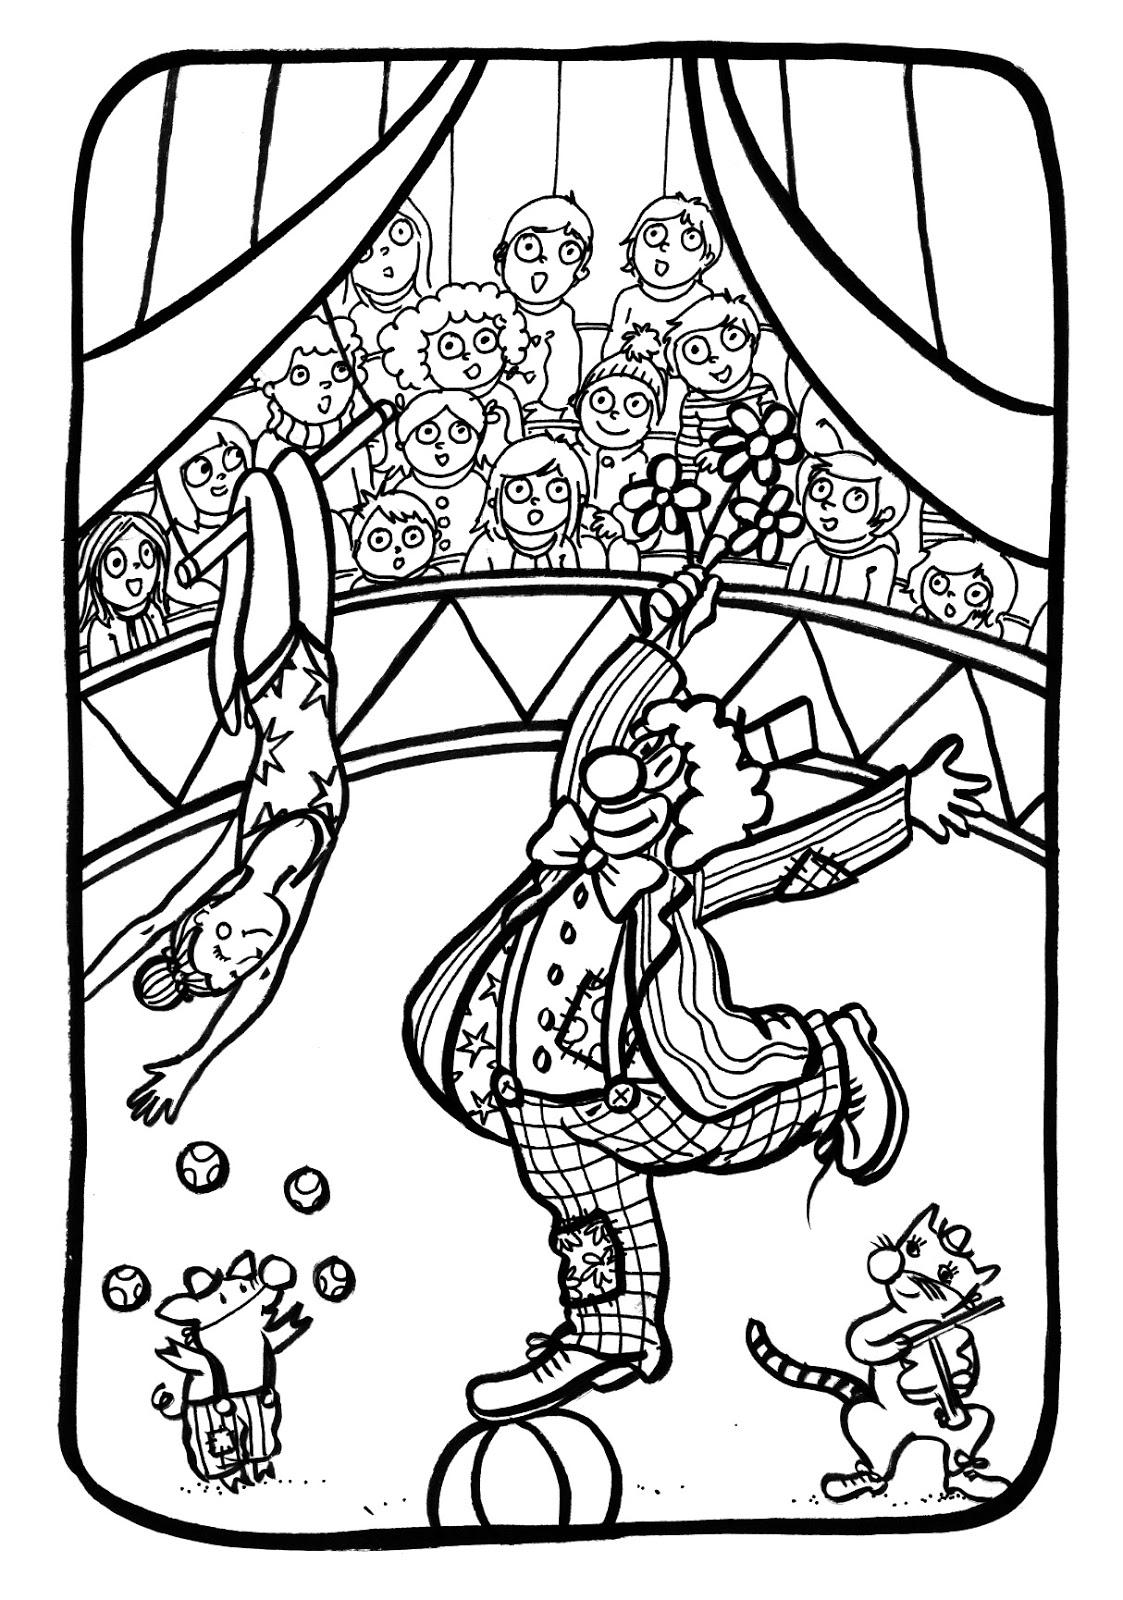 Coloriage Piste Cirque.Marion De Castillon Coloriage Du Mercredi Au Cirque